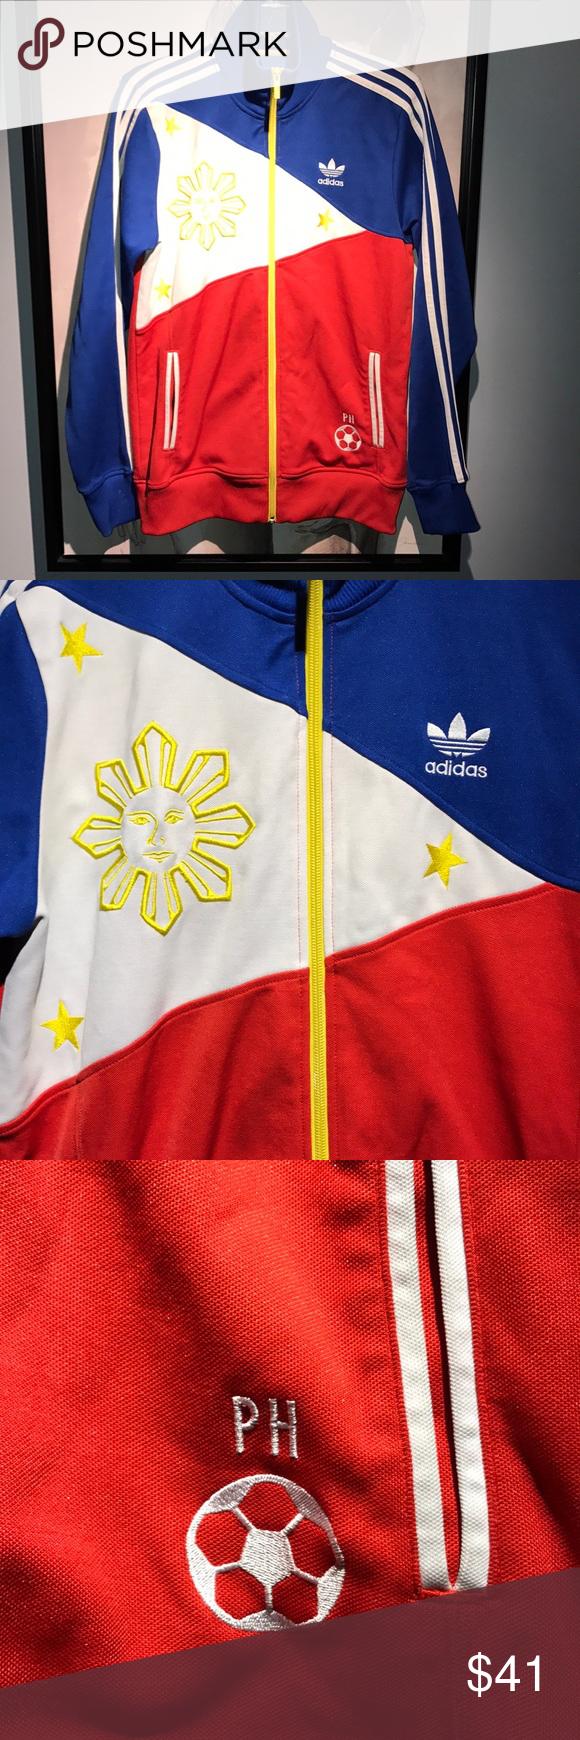 Adidas filippine traccia giacca pinterest adidas, prezzo scontato